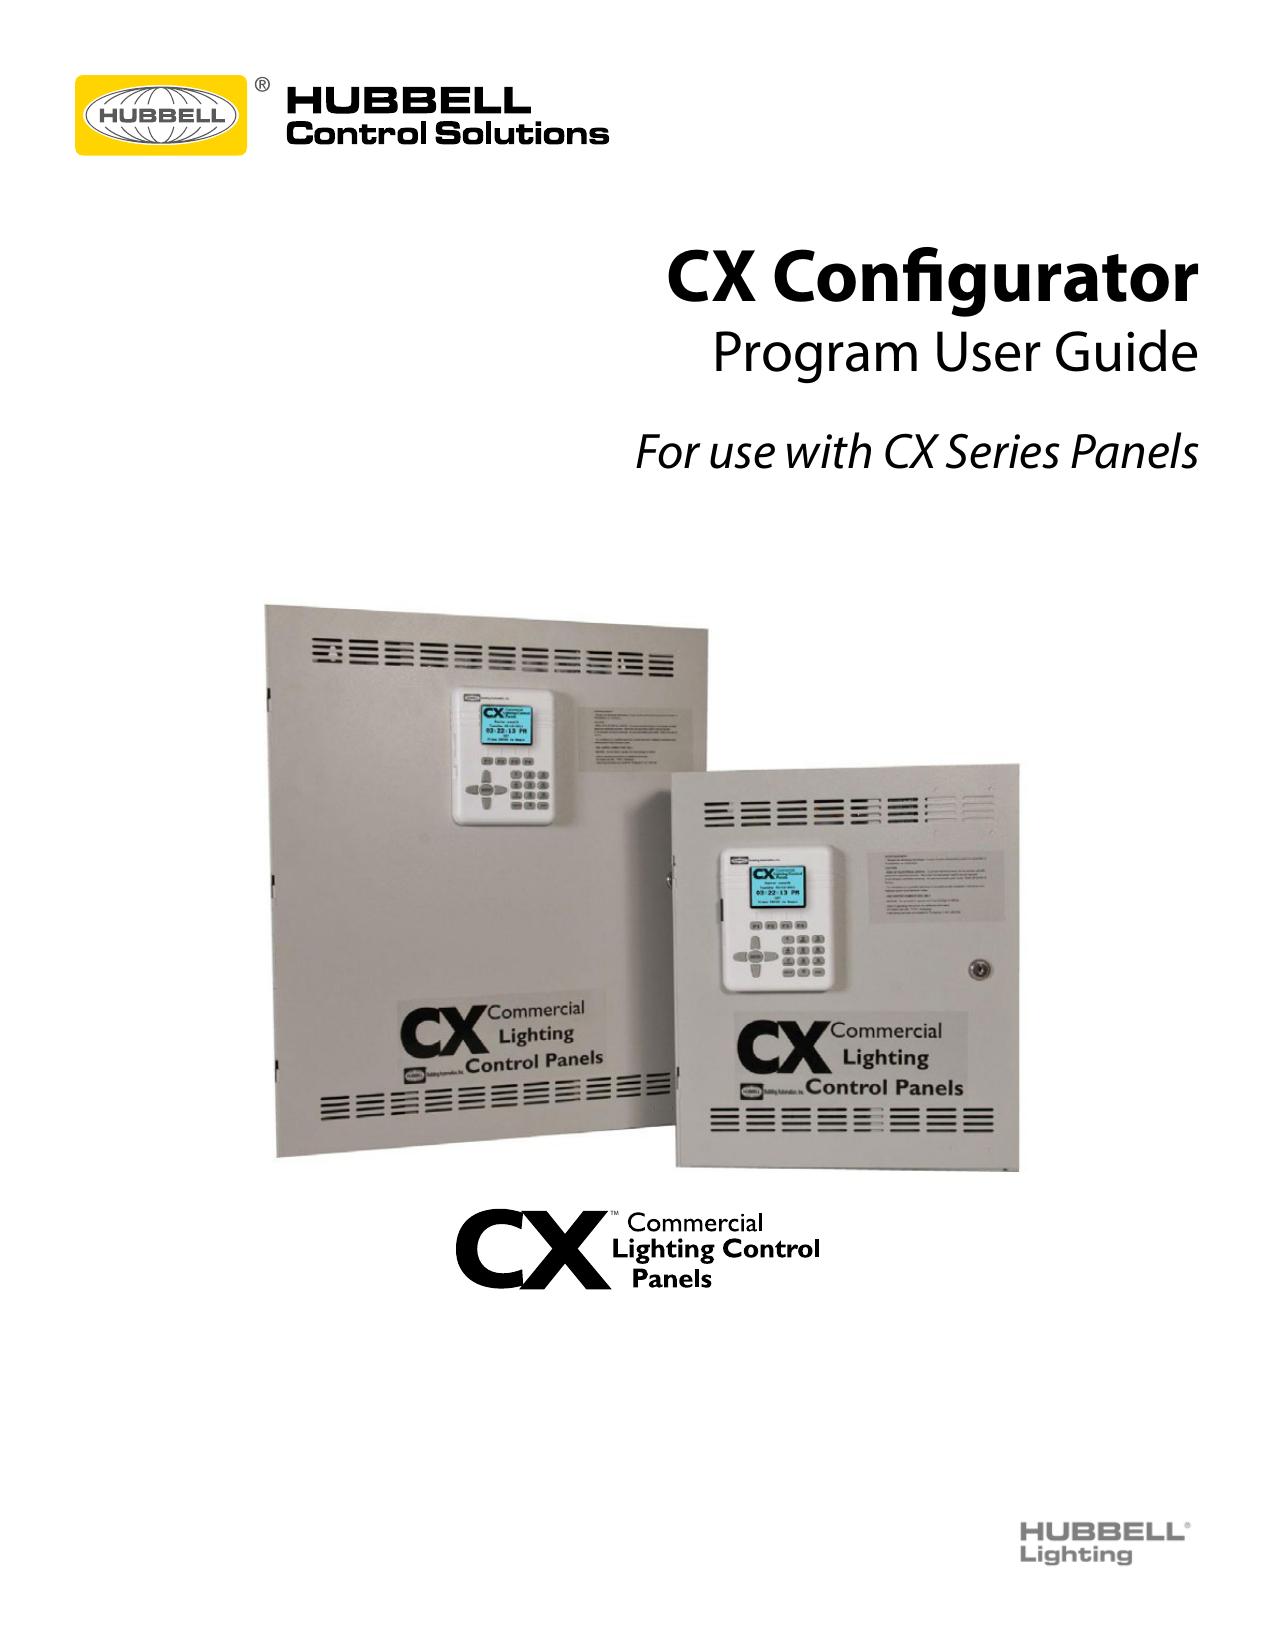 Cx Configurator Hubbell Control Solutions Manualzz